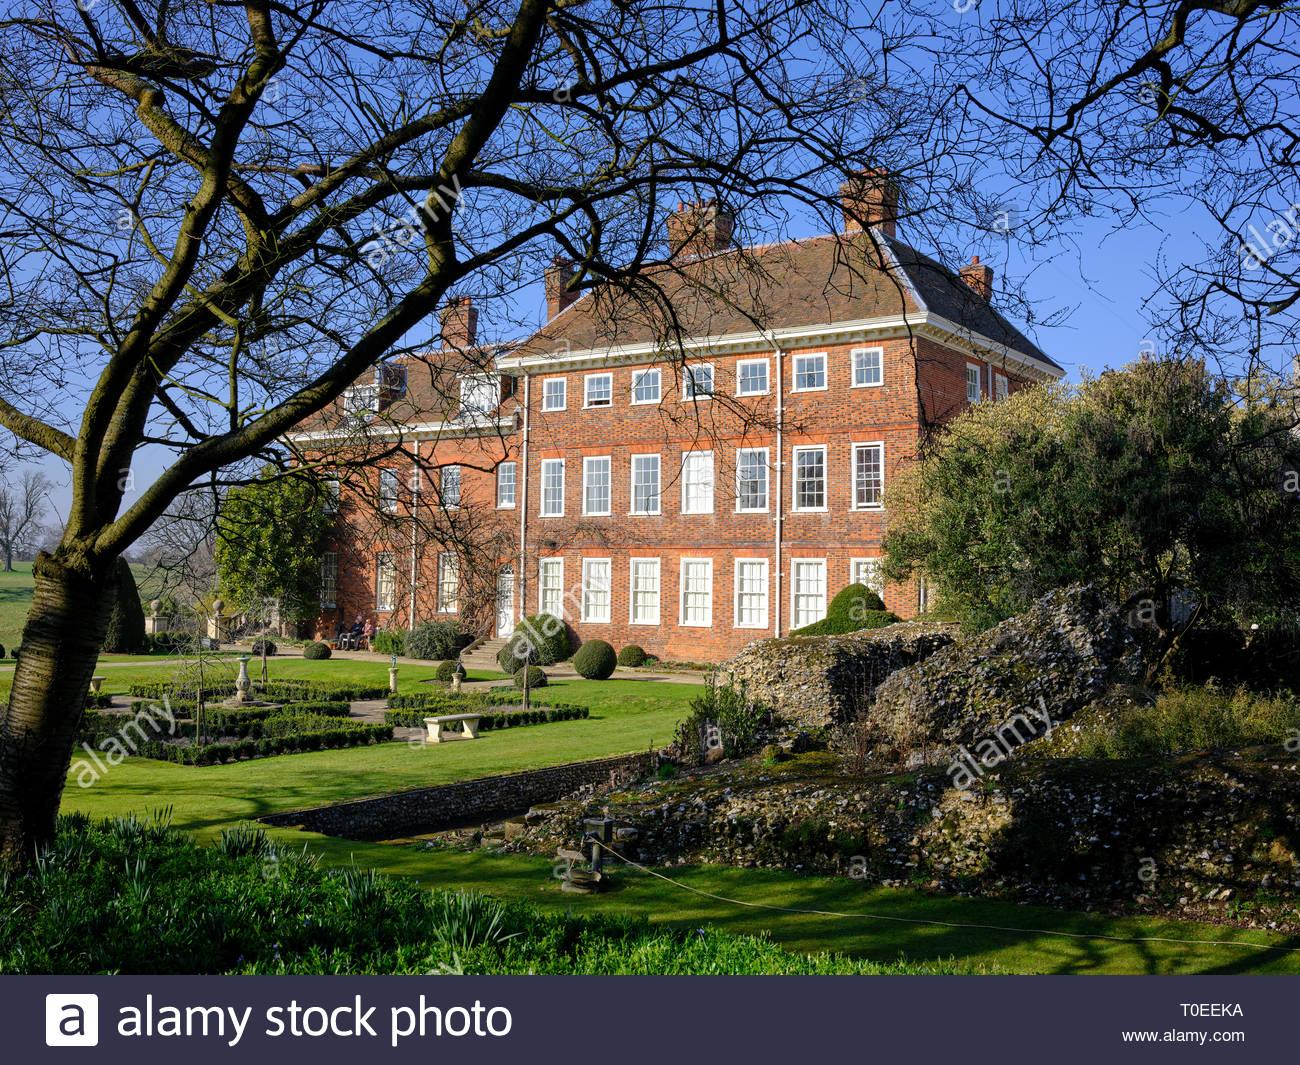 Historic Manor House at Benington Lordship Gardens, Hertfordshire - Stock Image